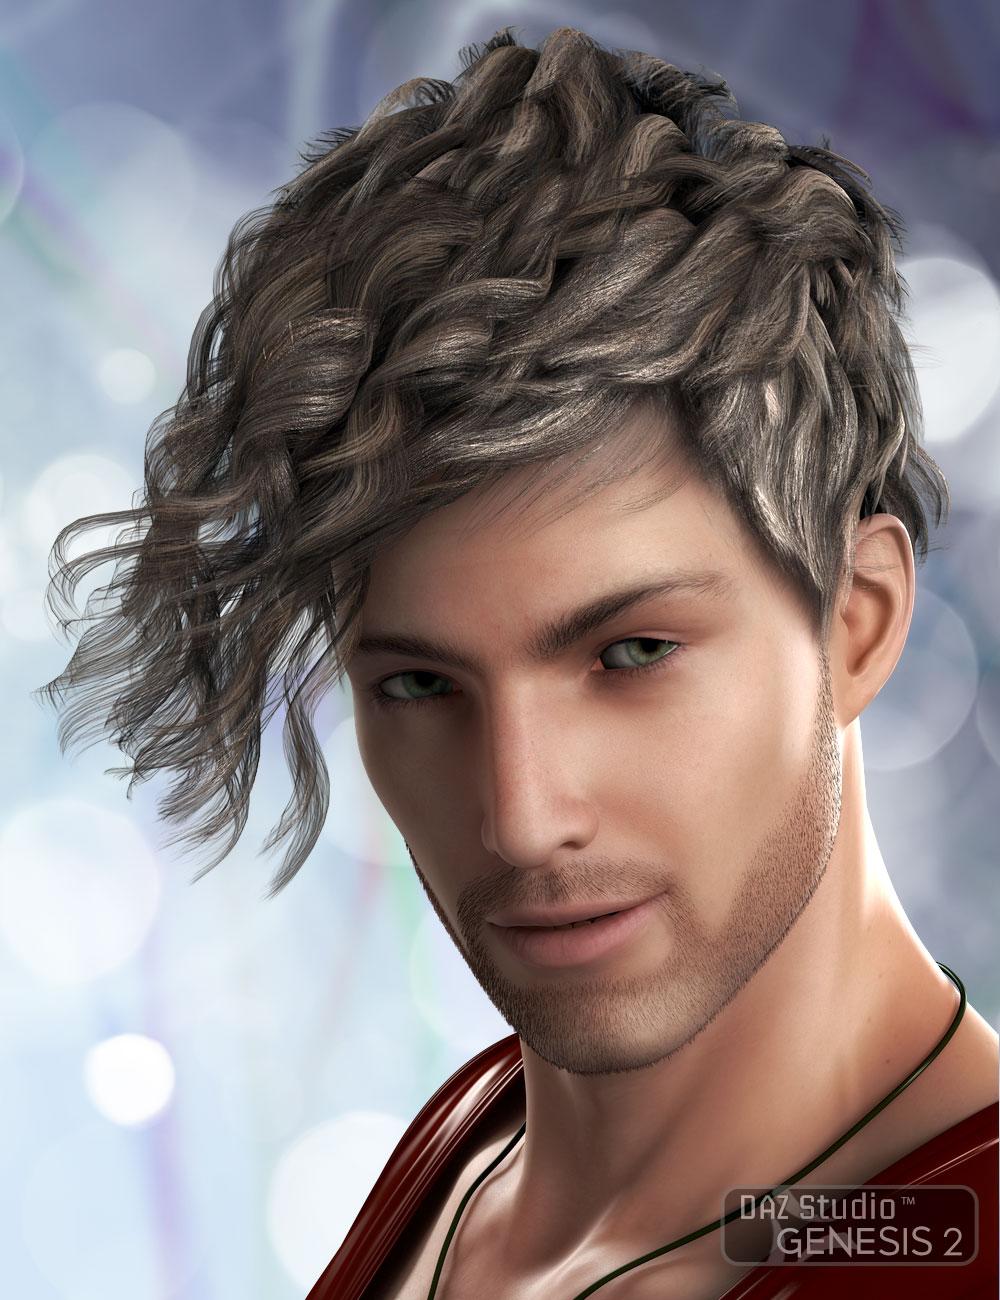 Sebastian Hair for Genesis 2 by: AprilYSH, 3D Models by Daz 3D